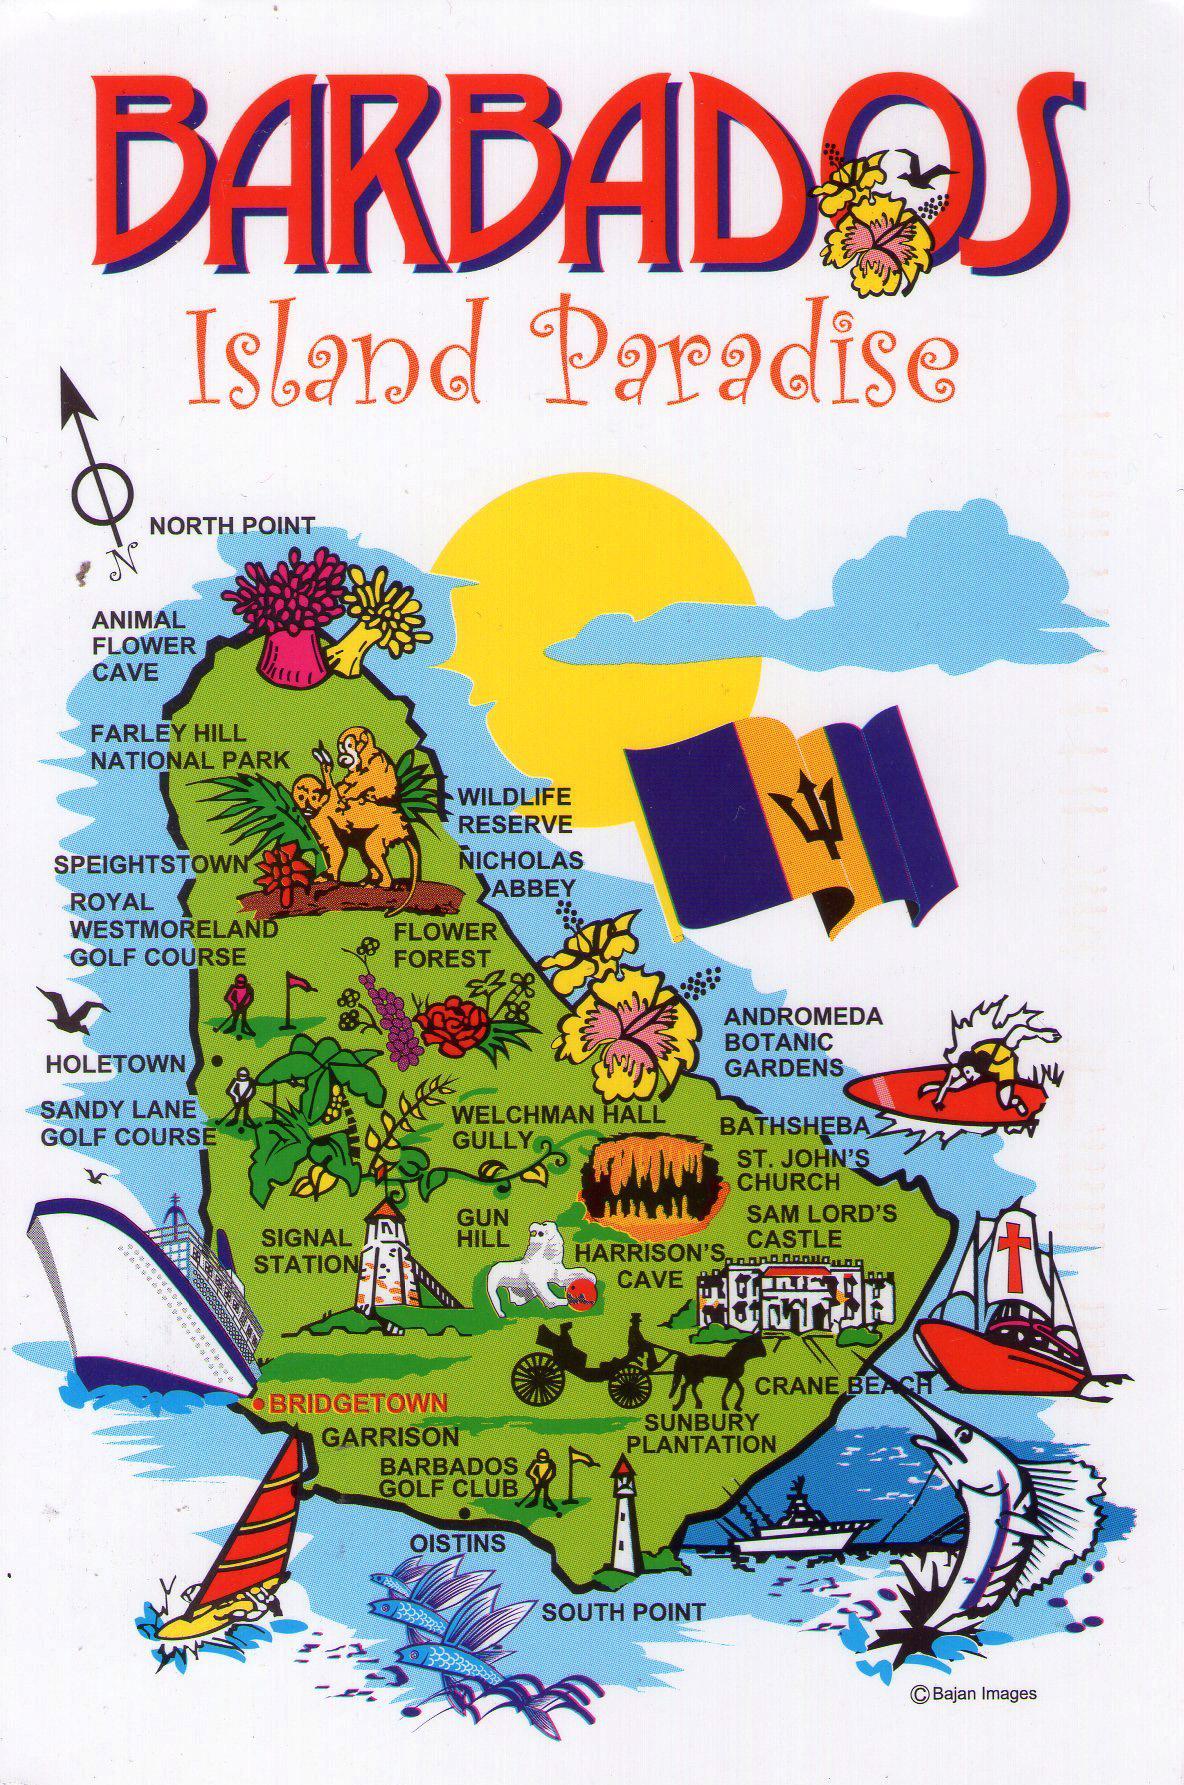 Large Barbados travel illustrated map | Barbados | North ...